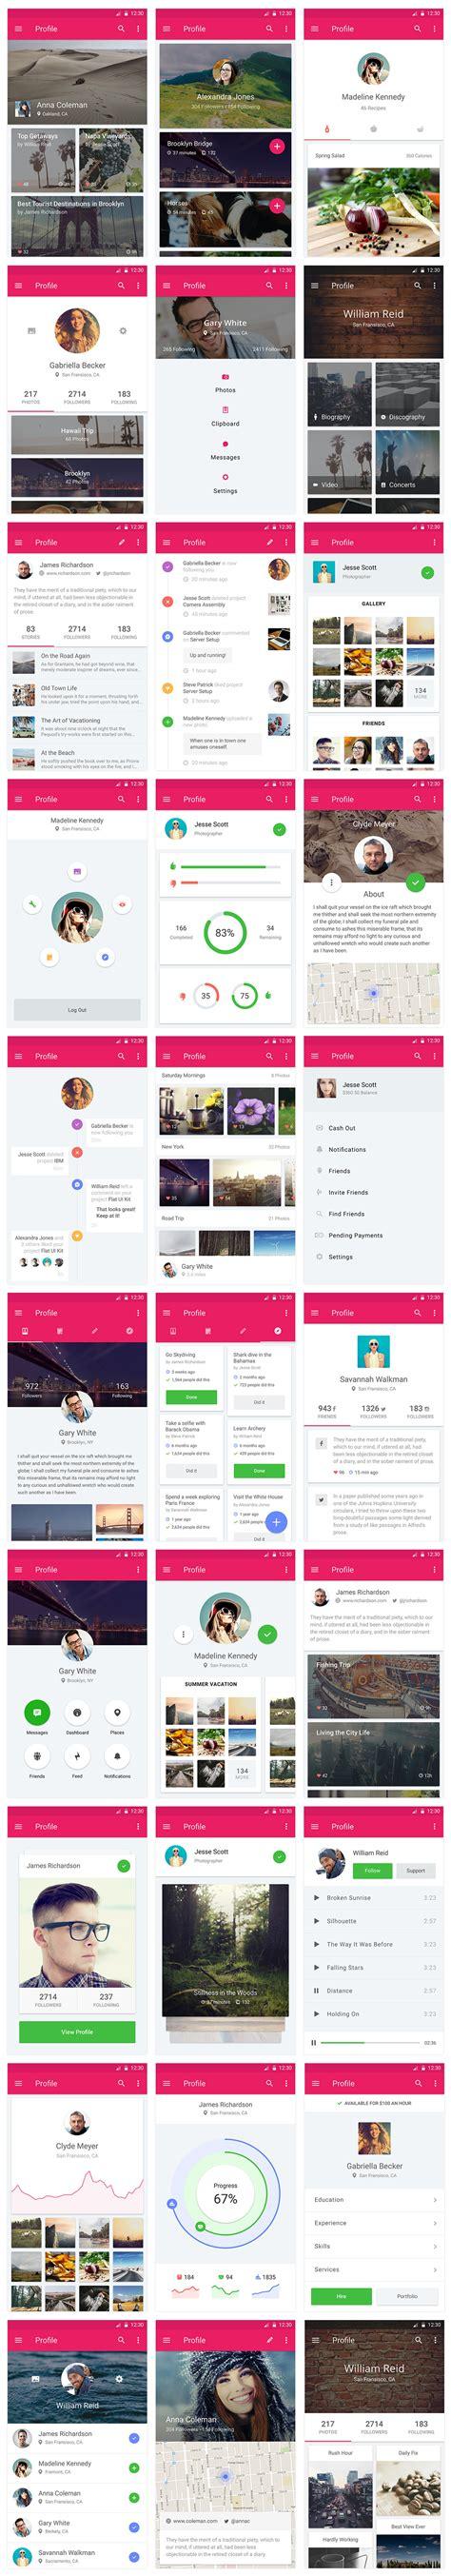 design app book material design ui kit on behance